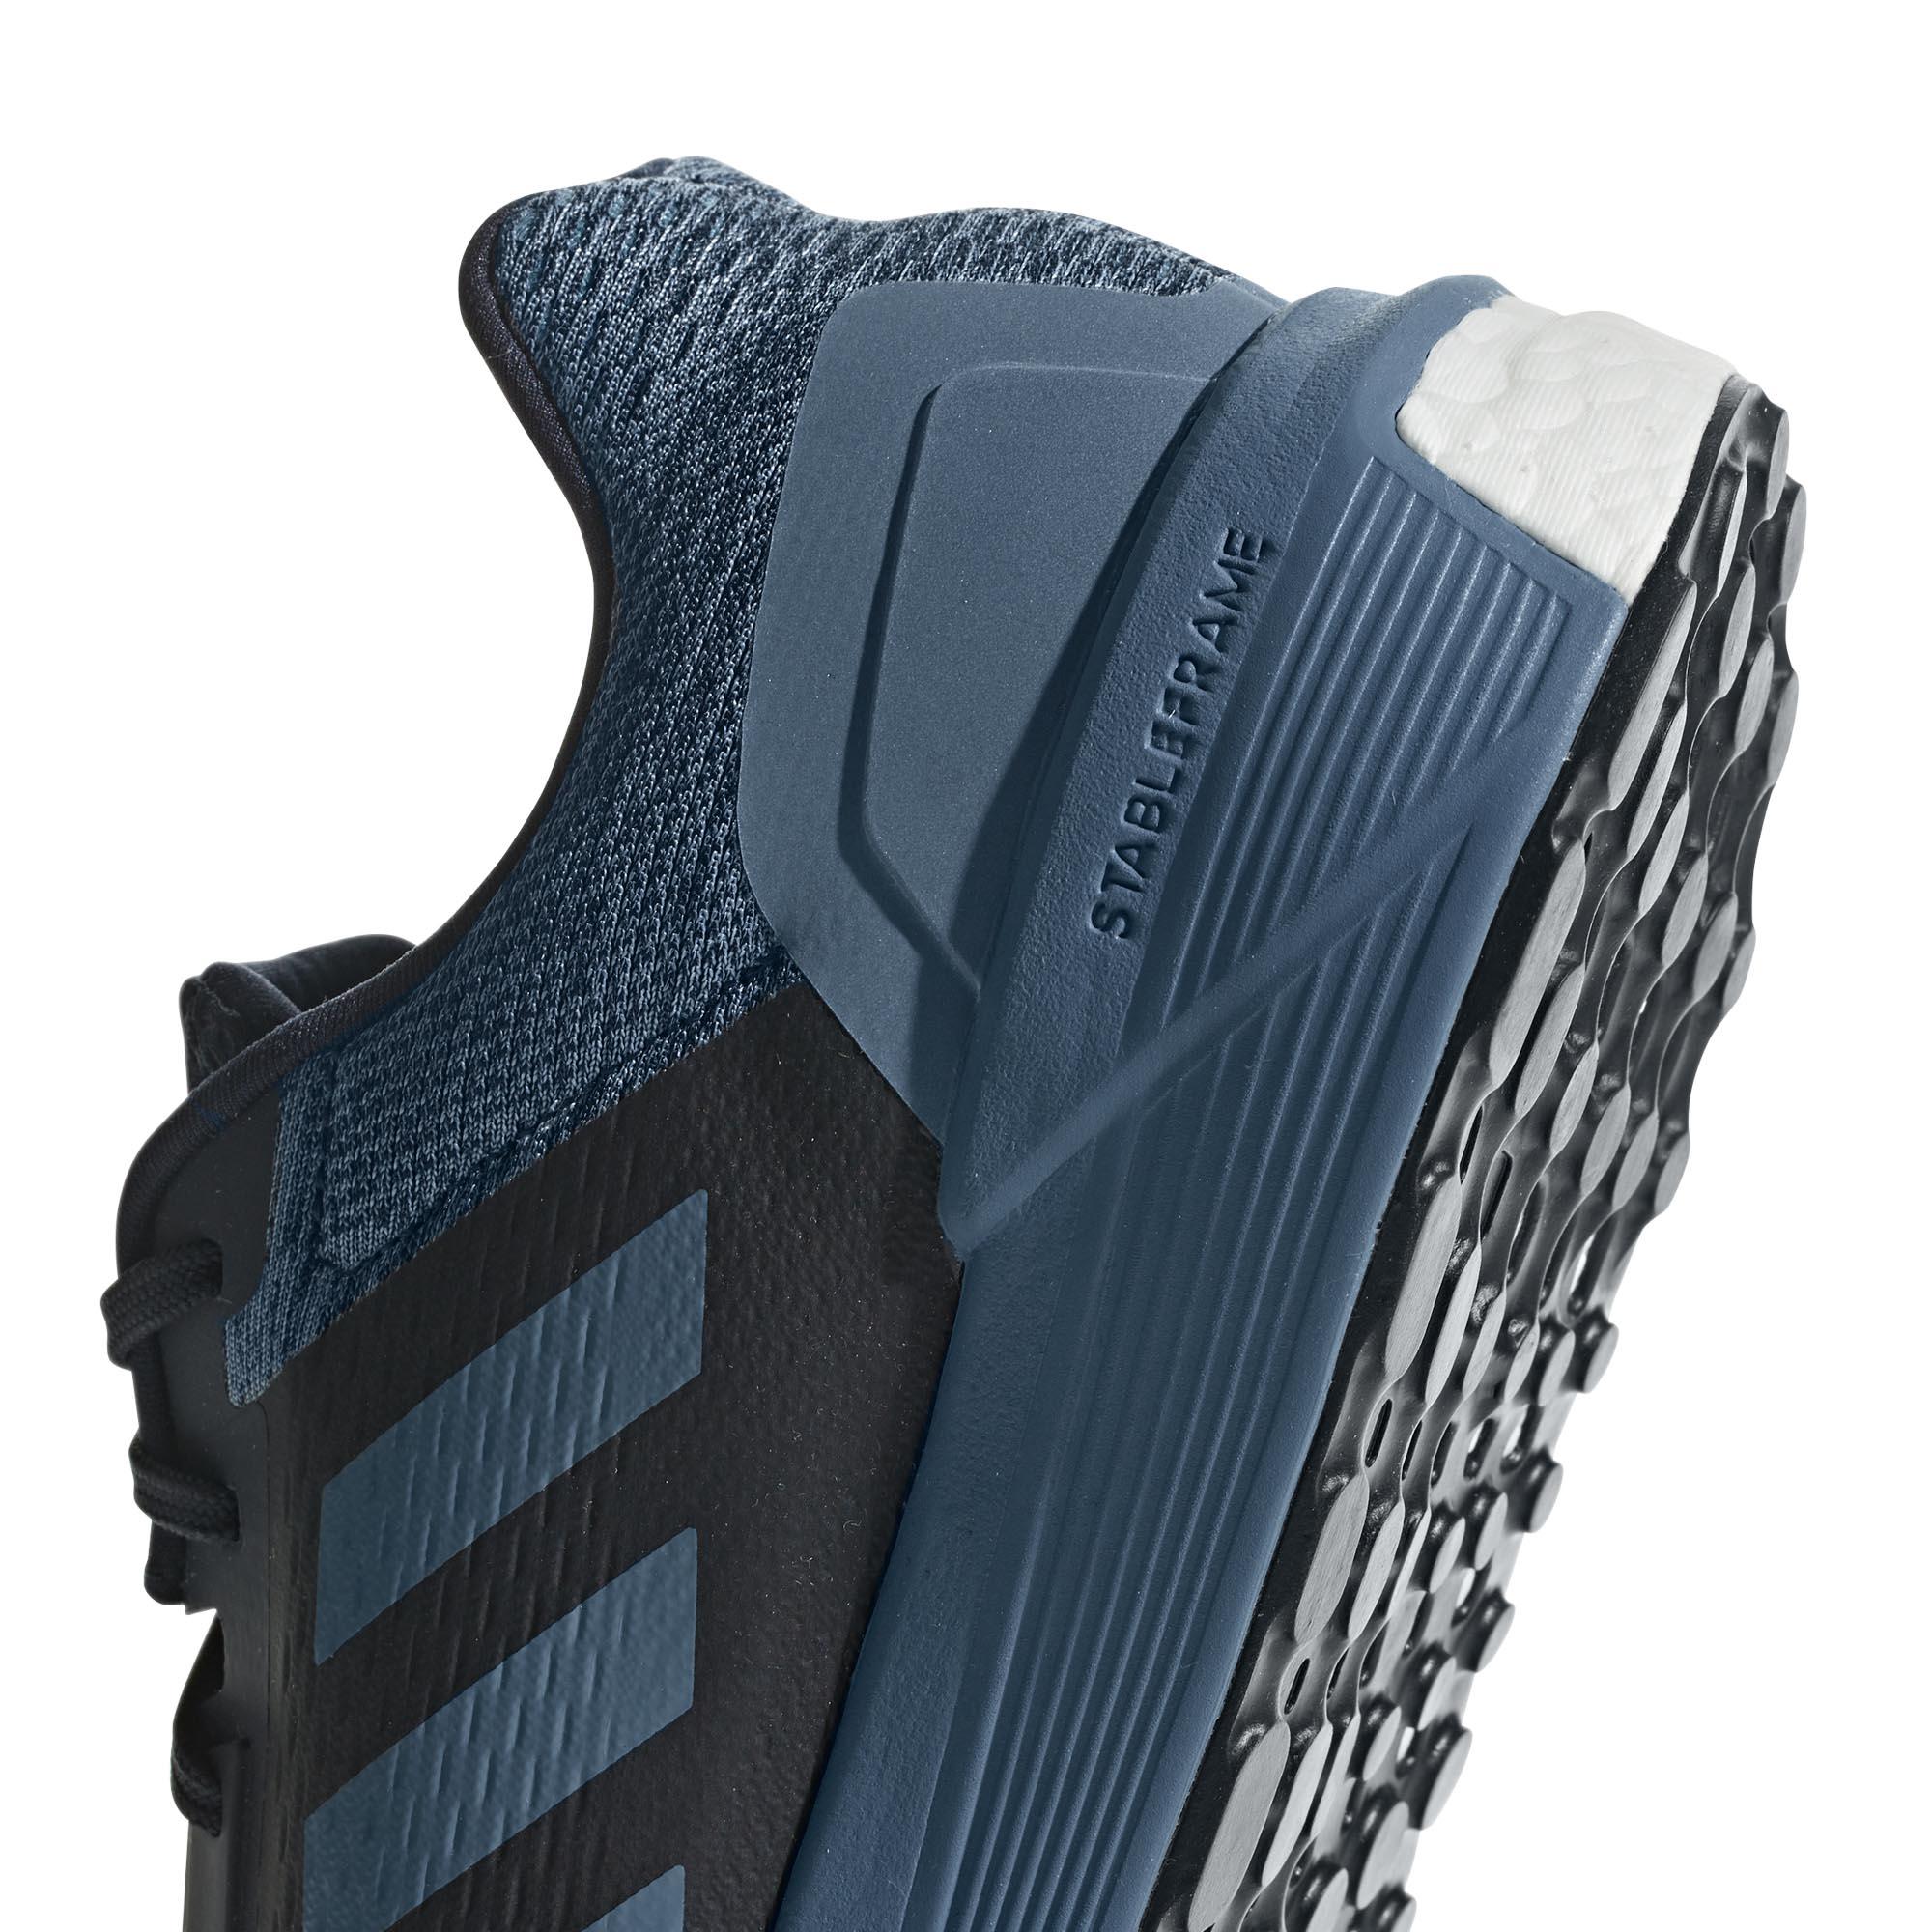 Adidas Solar Drive Drive Drive ST Mens Structurot Running Trainer schuhe Blau 52d7a9